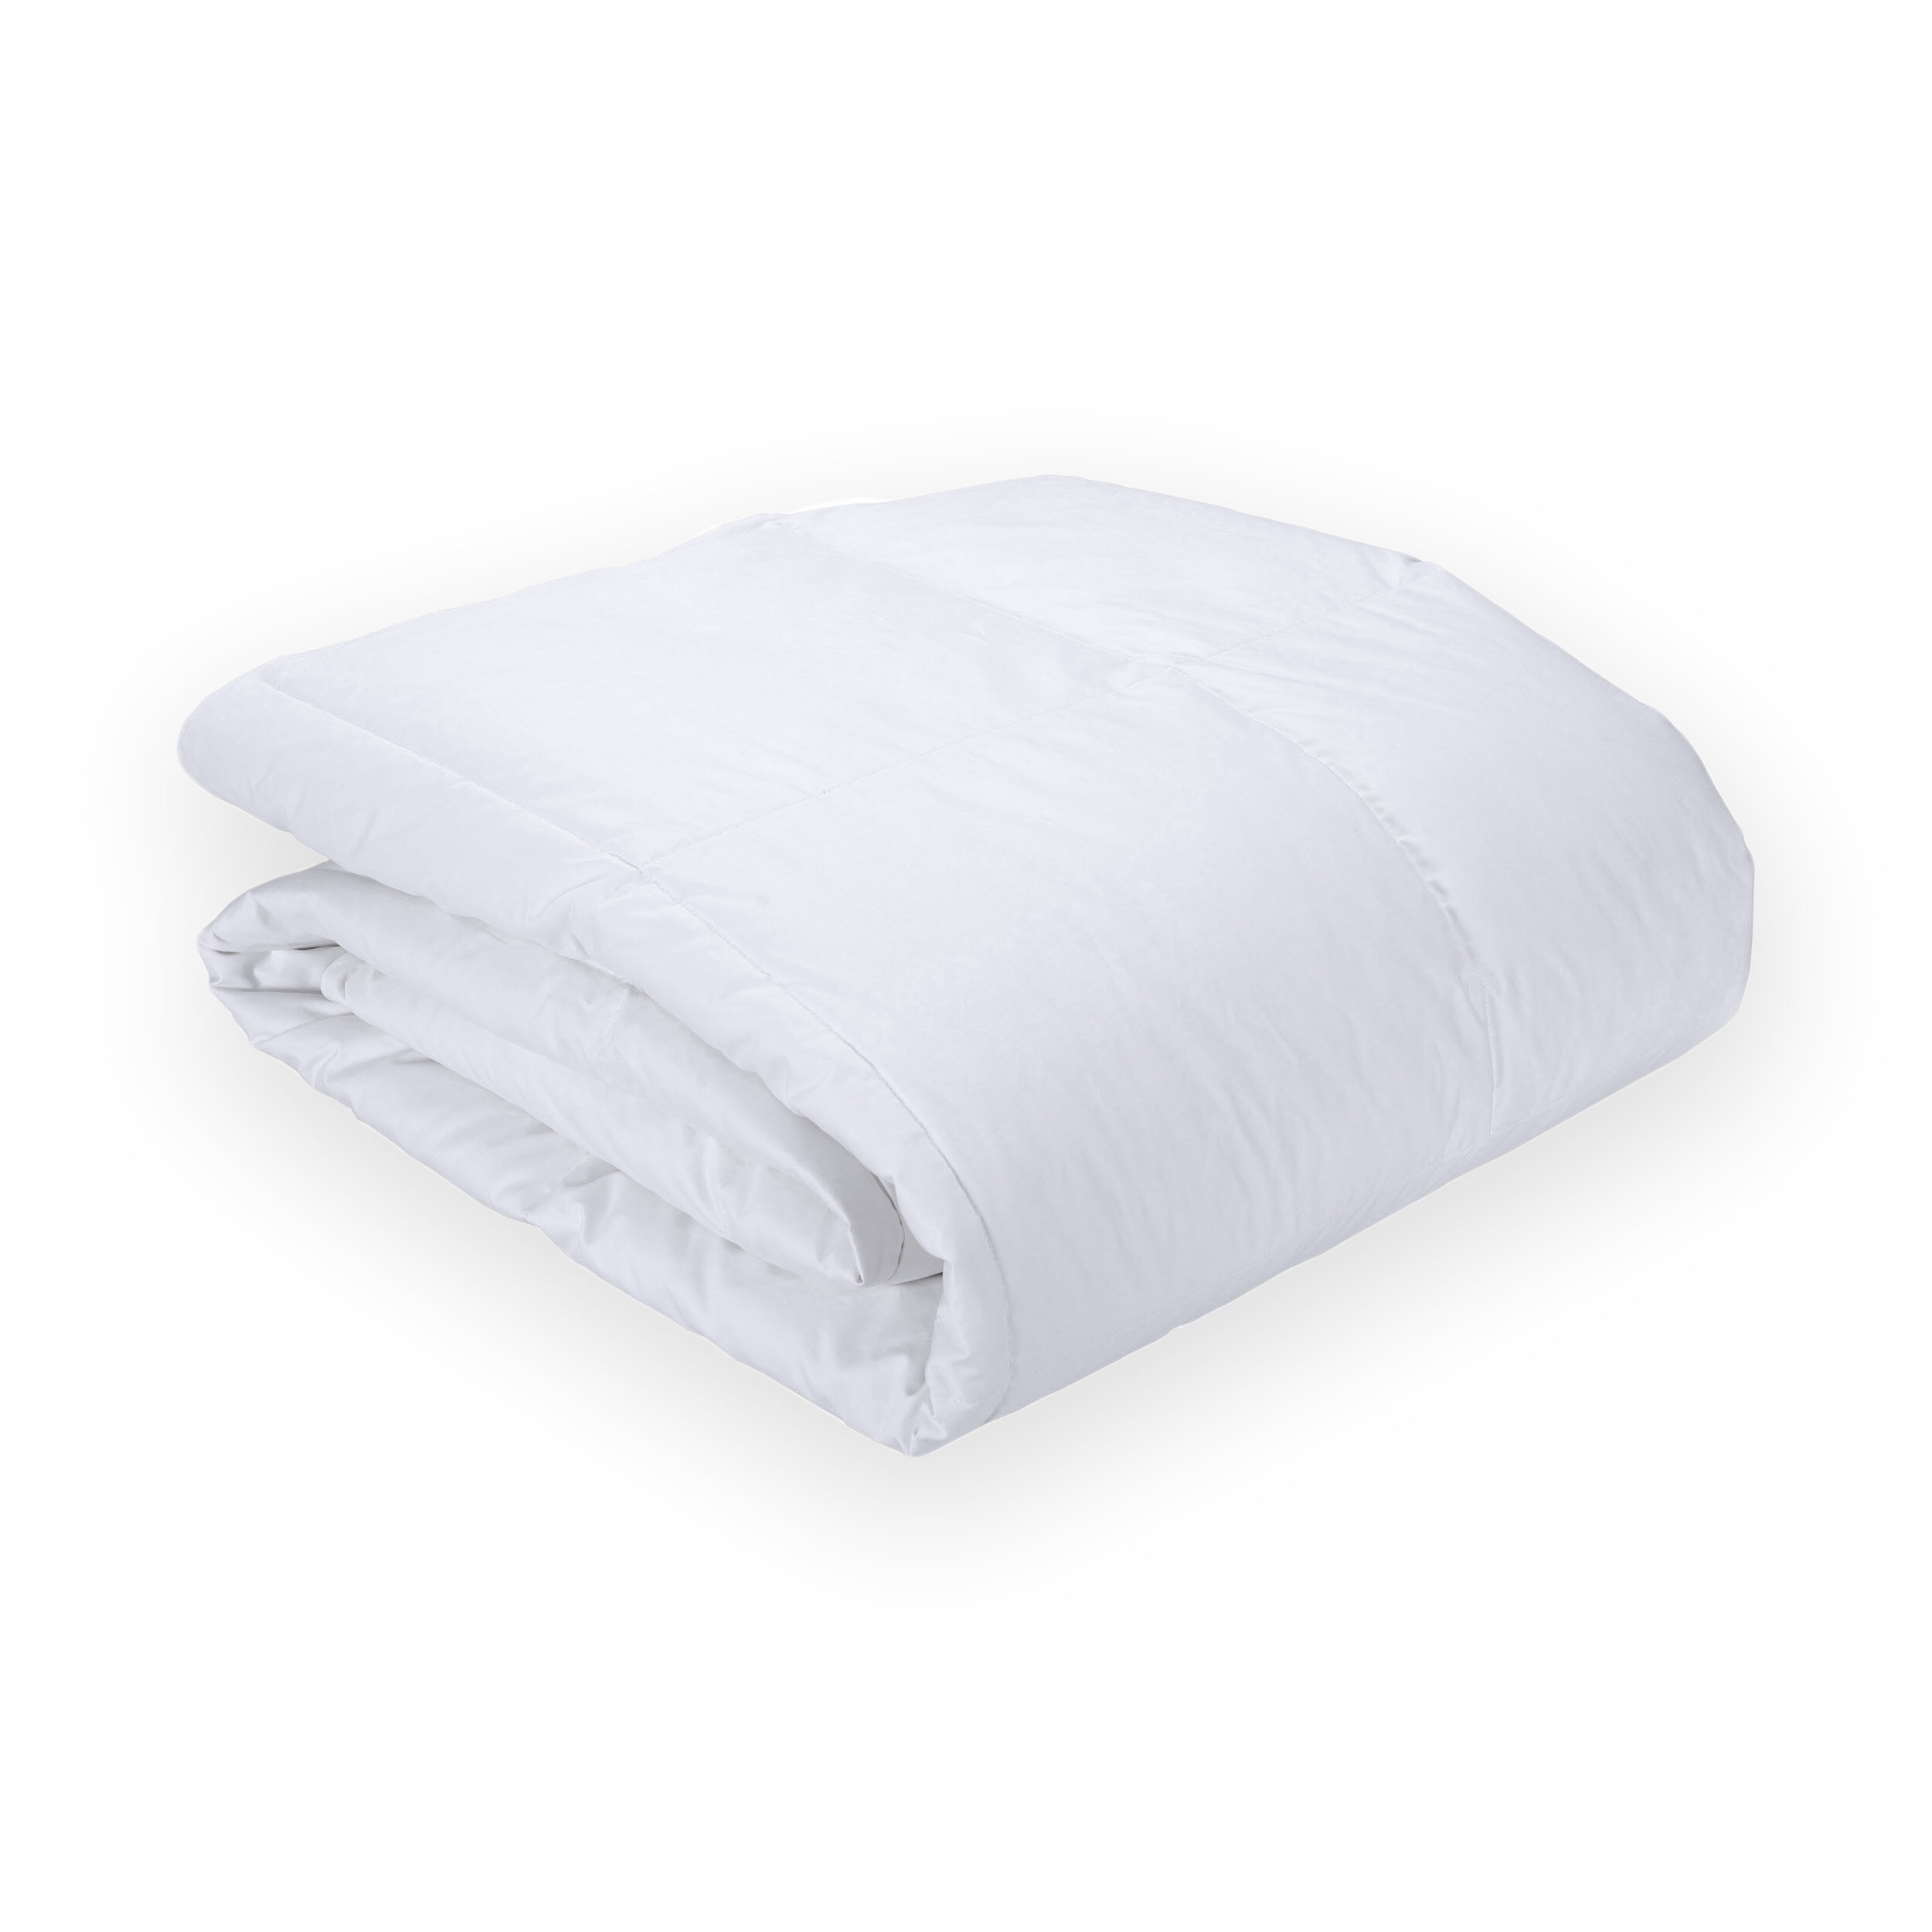 wayfair to comforter buy lightweight st stjames down pdx reviews home james how luxe a bath bed